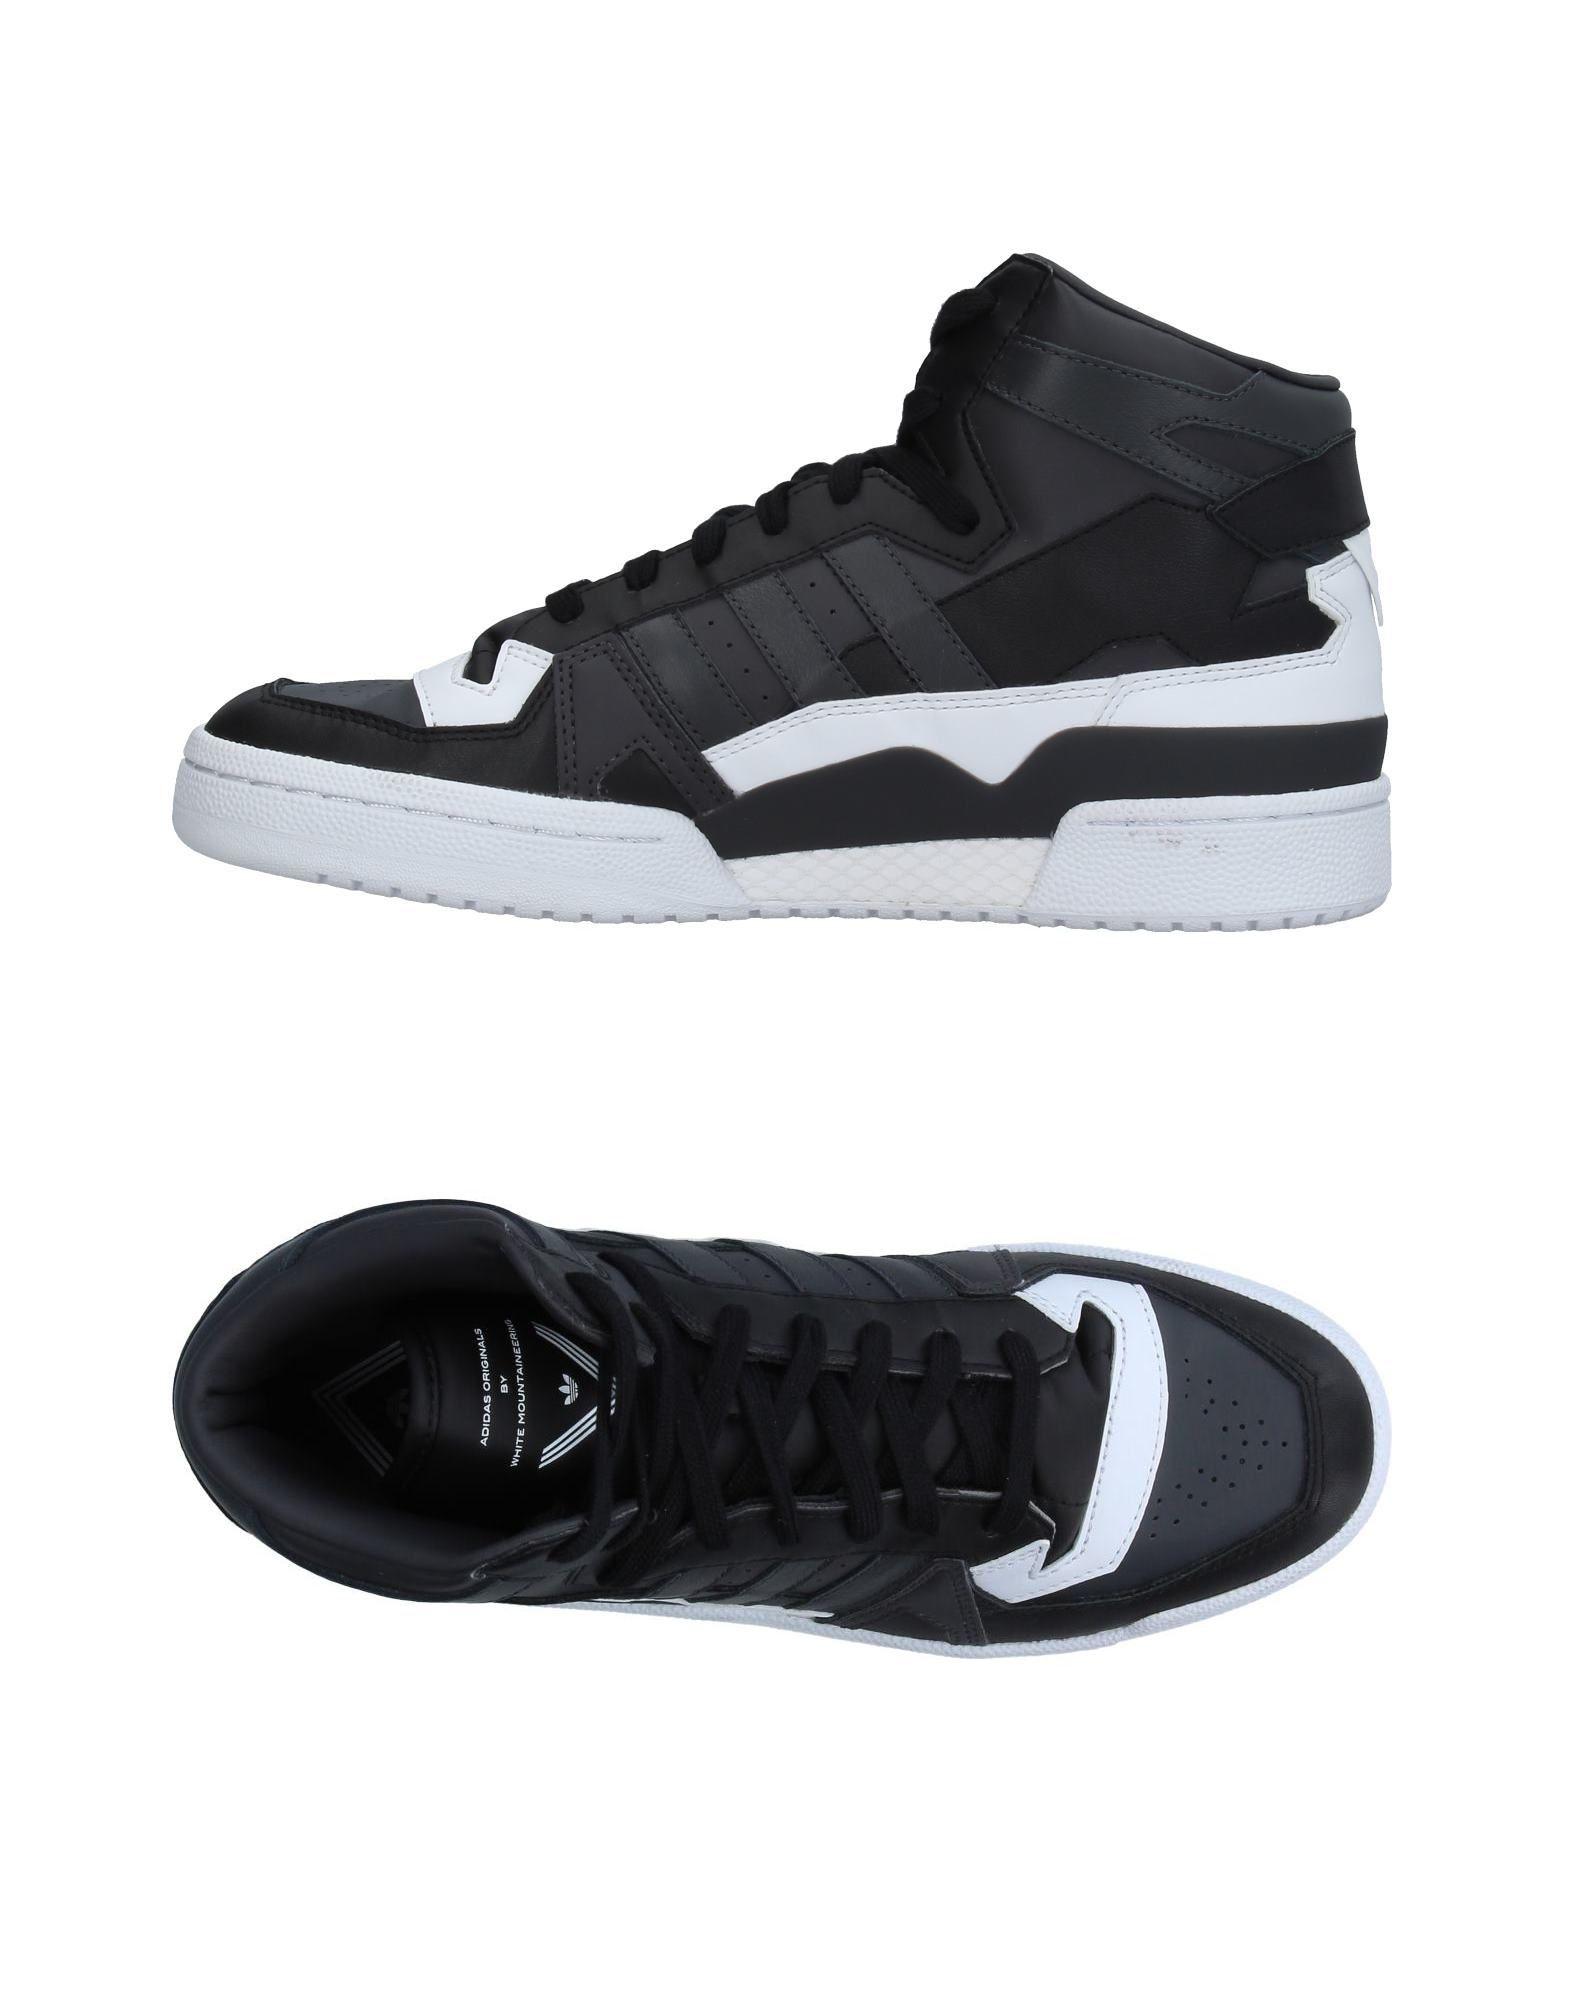 ADIDAS ORIGINALS by WHITE MOUNTAINEERING Высокие кеды и кроссовки кеды кроссовки высокие dc evan hi zero black white